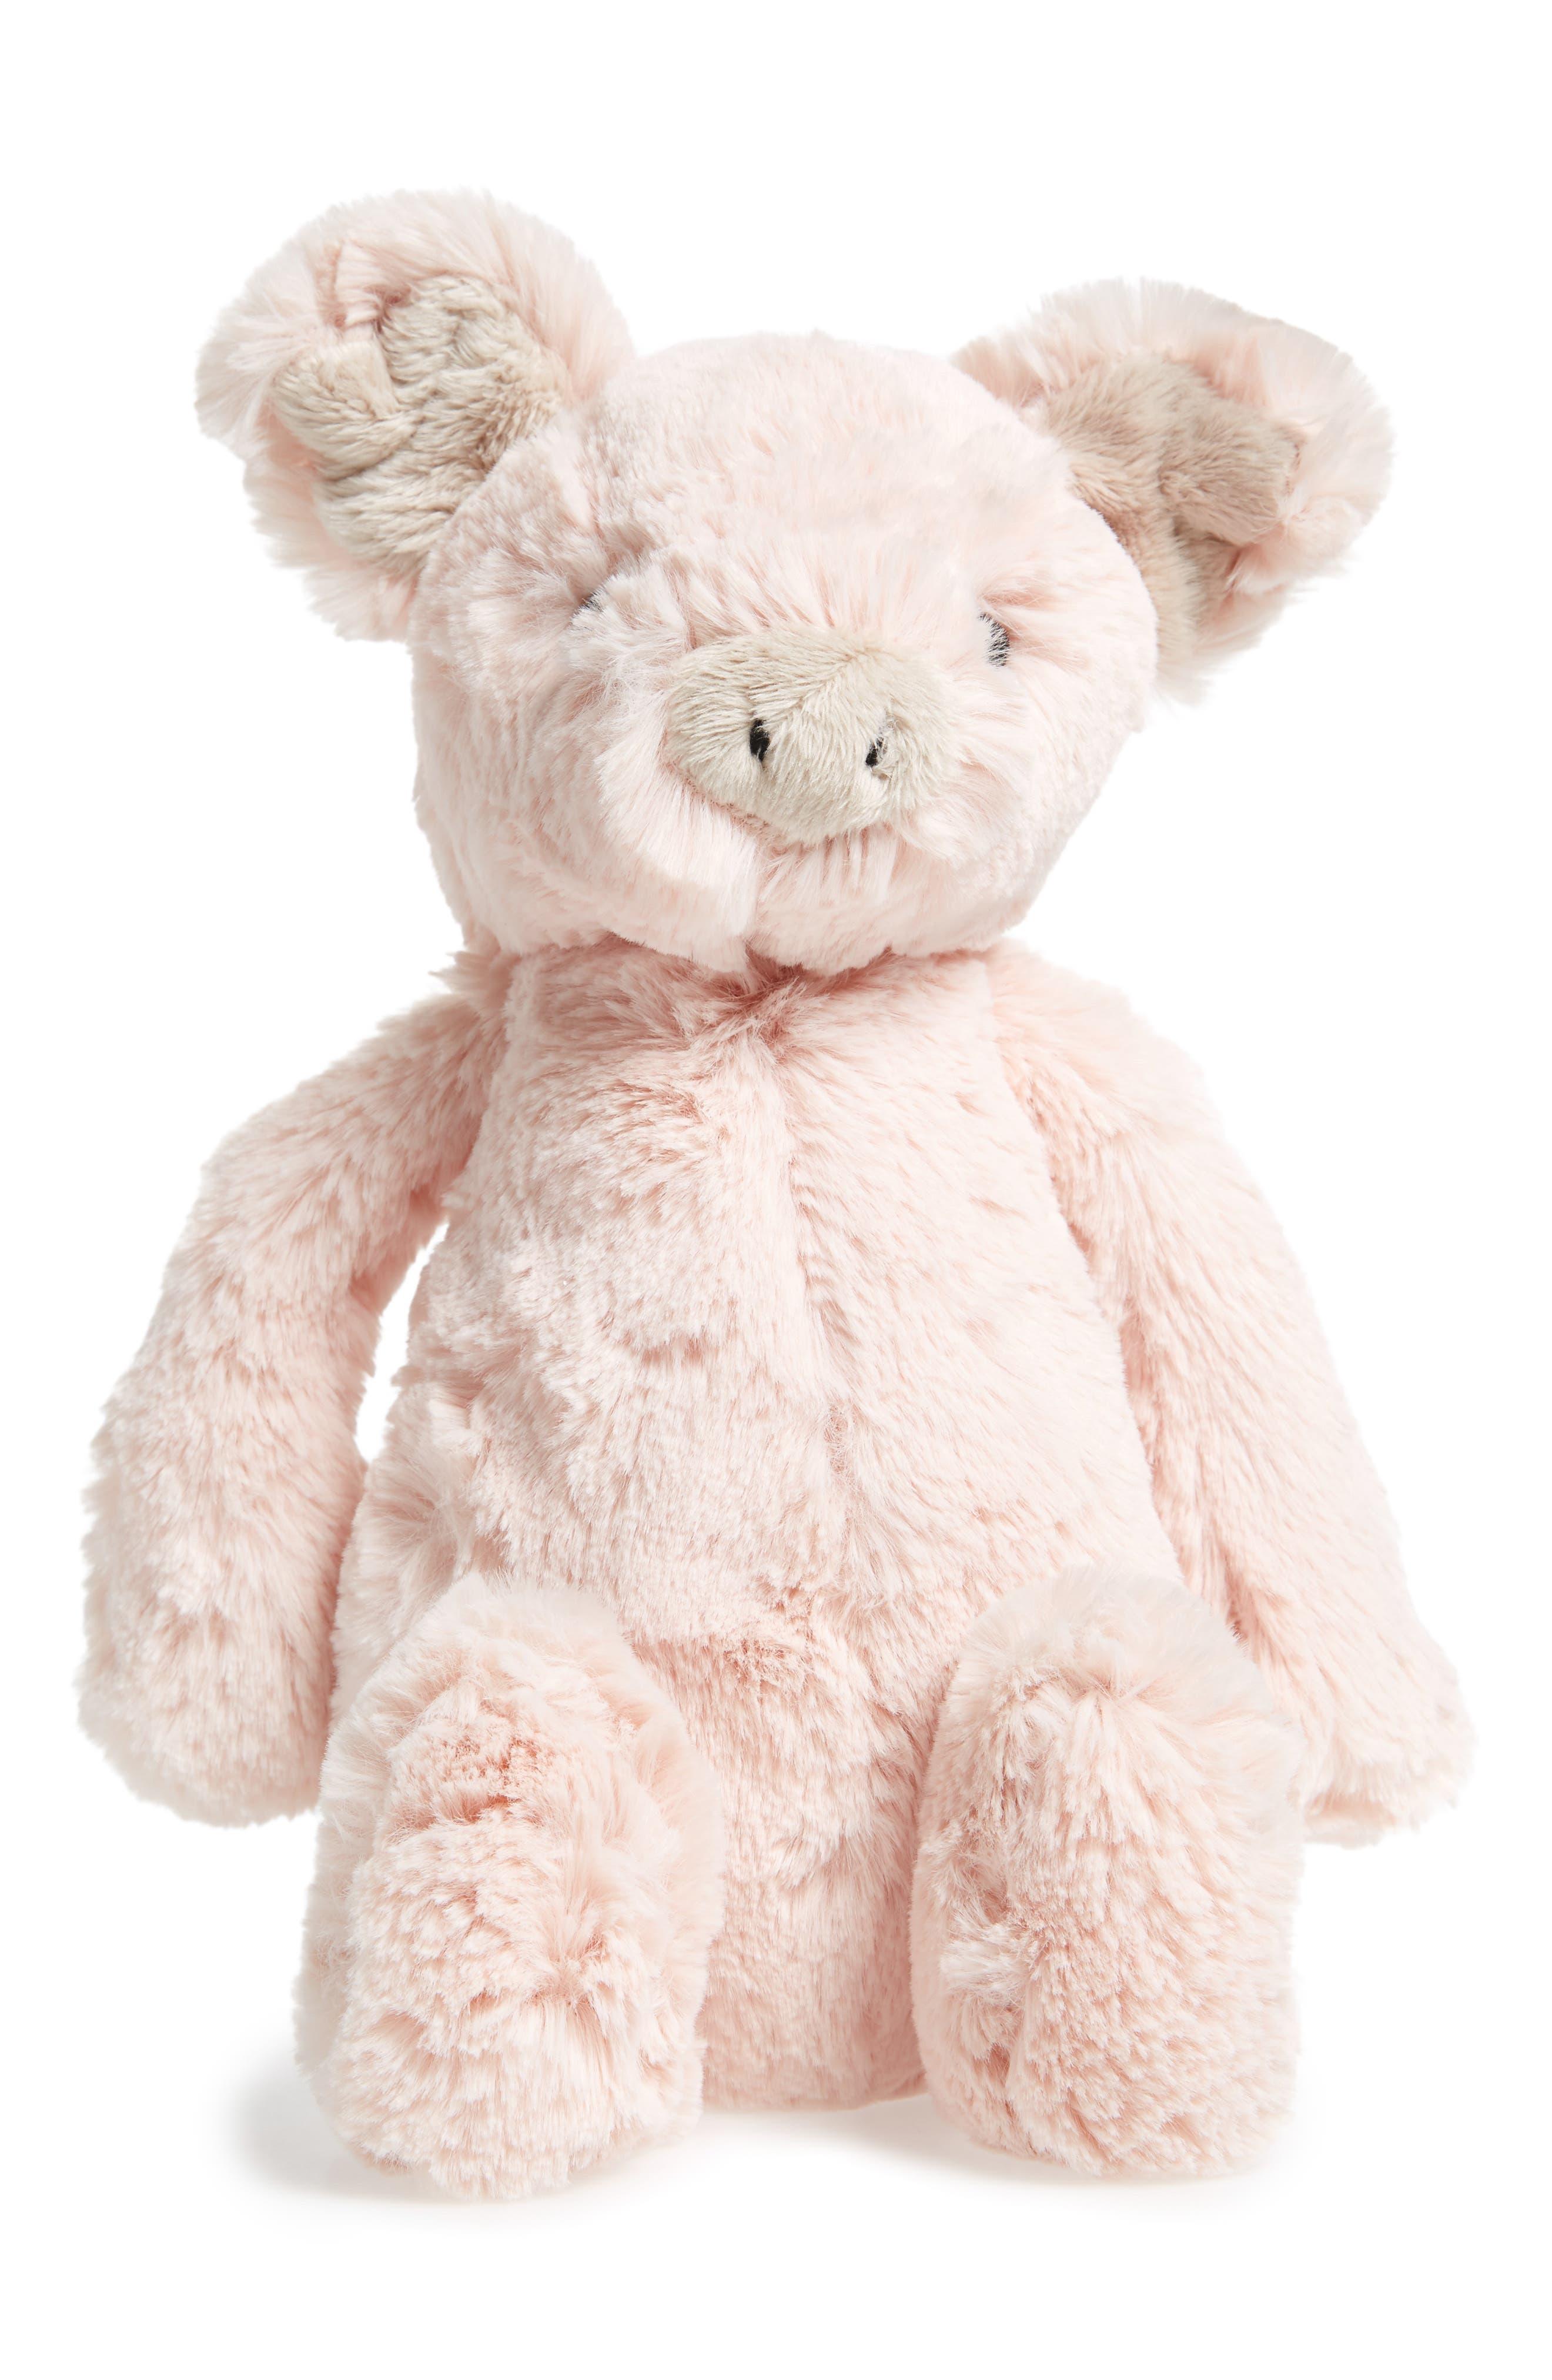 'Bashful Piggy' Stuffed Animal,                             Main thumbnail 1, color,                             Pink